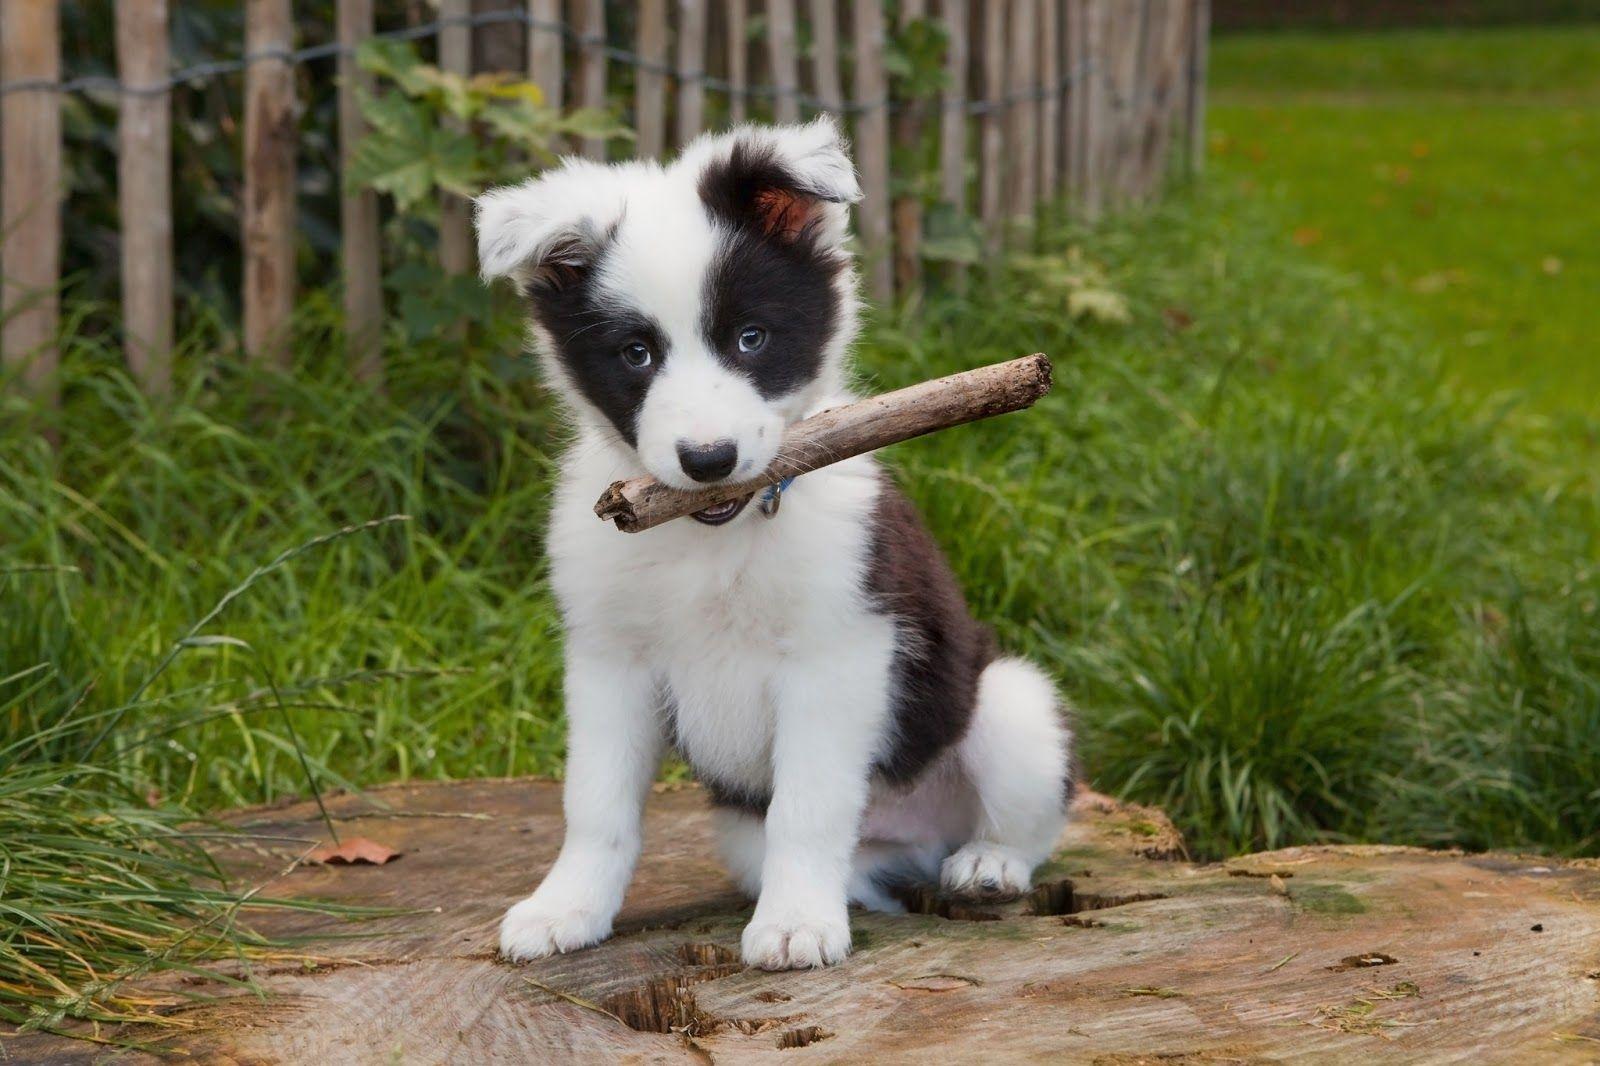 Mascotas Fotos De Animales Perritos Muy Lindos O Dogs Very Cute